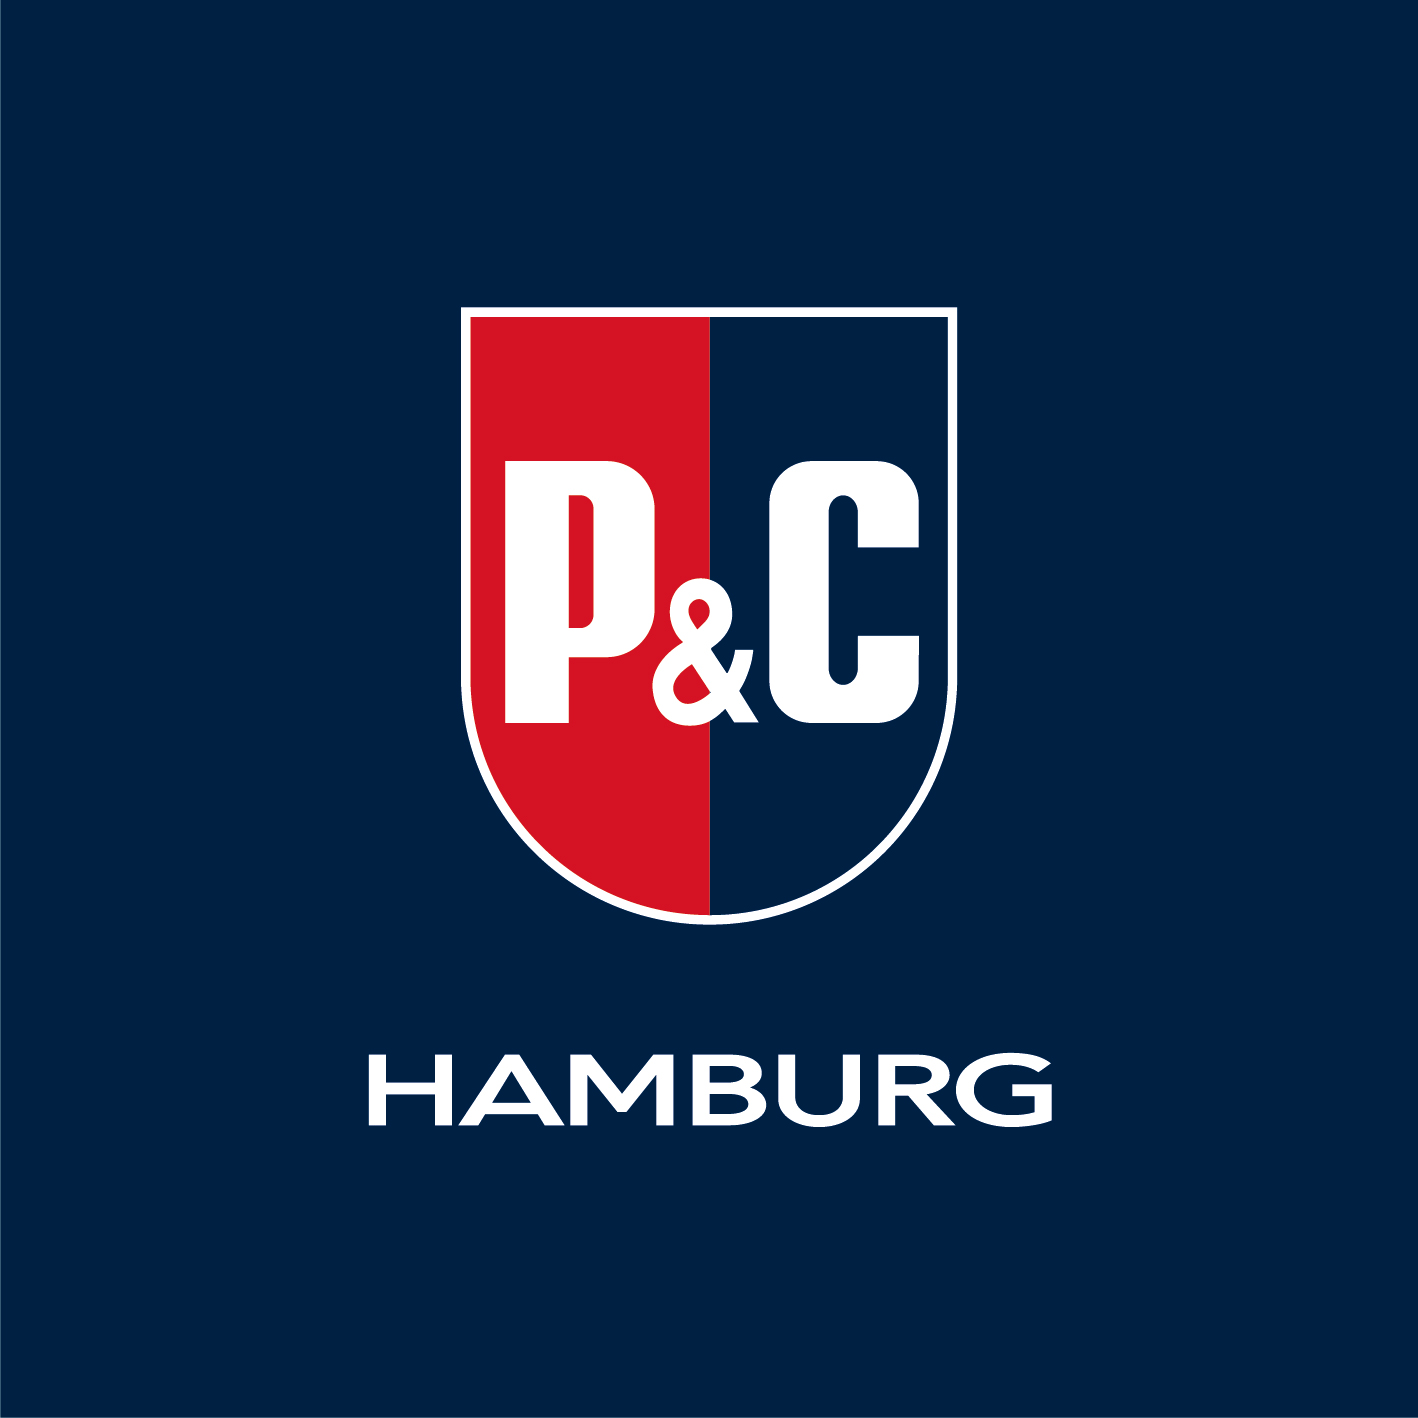 Peek & Clobbenburg